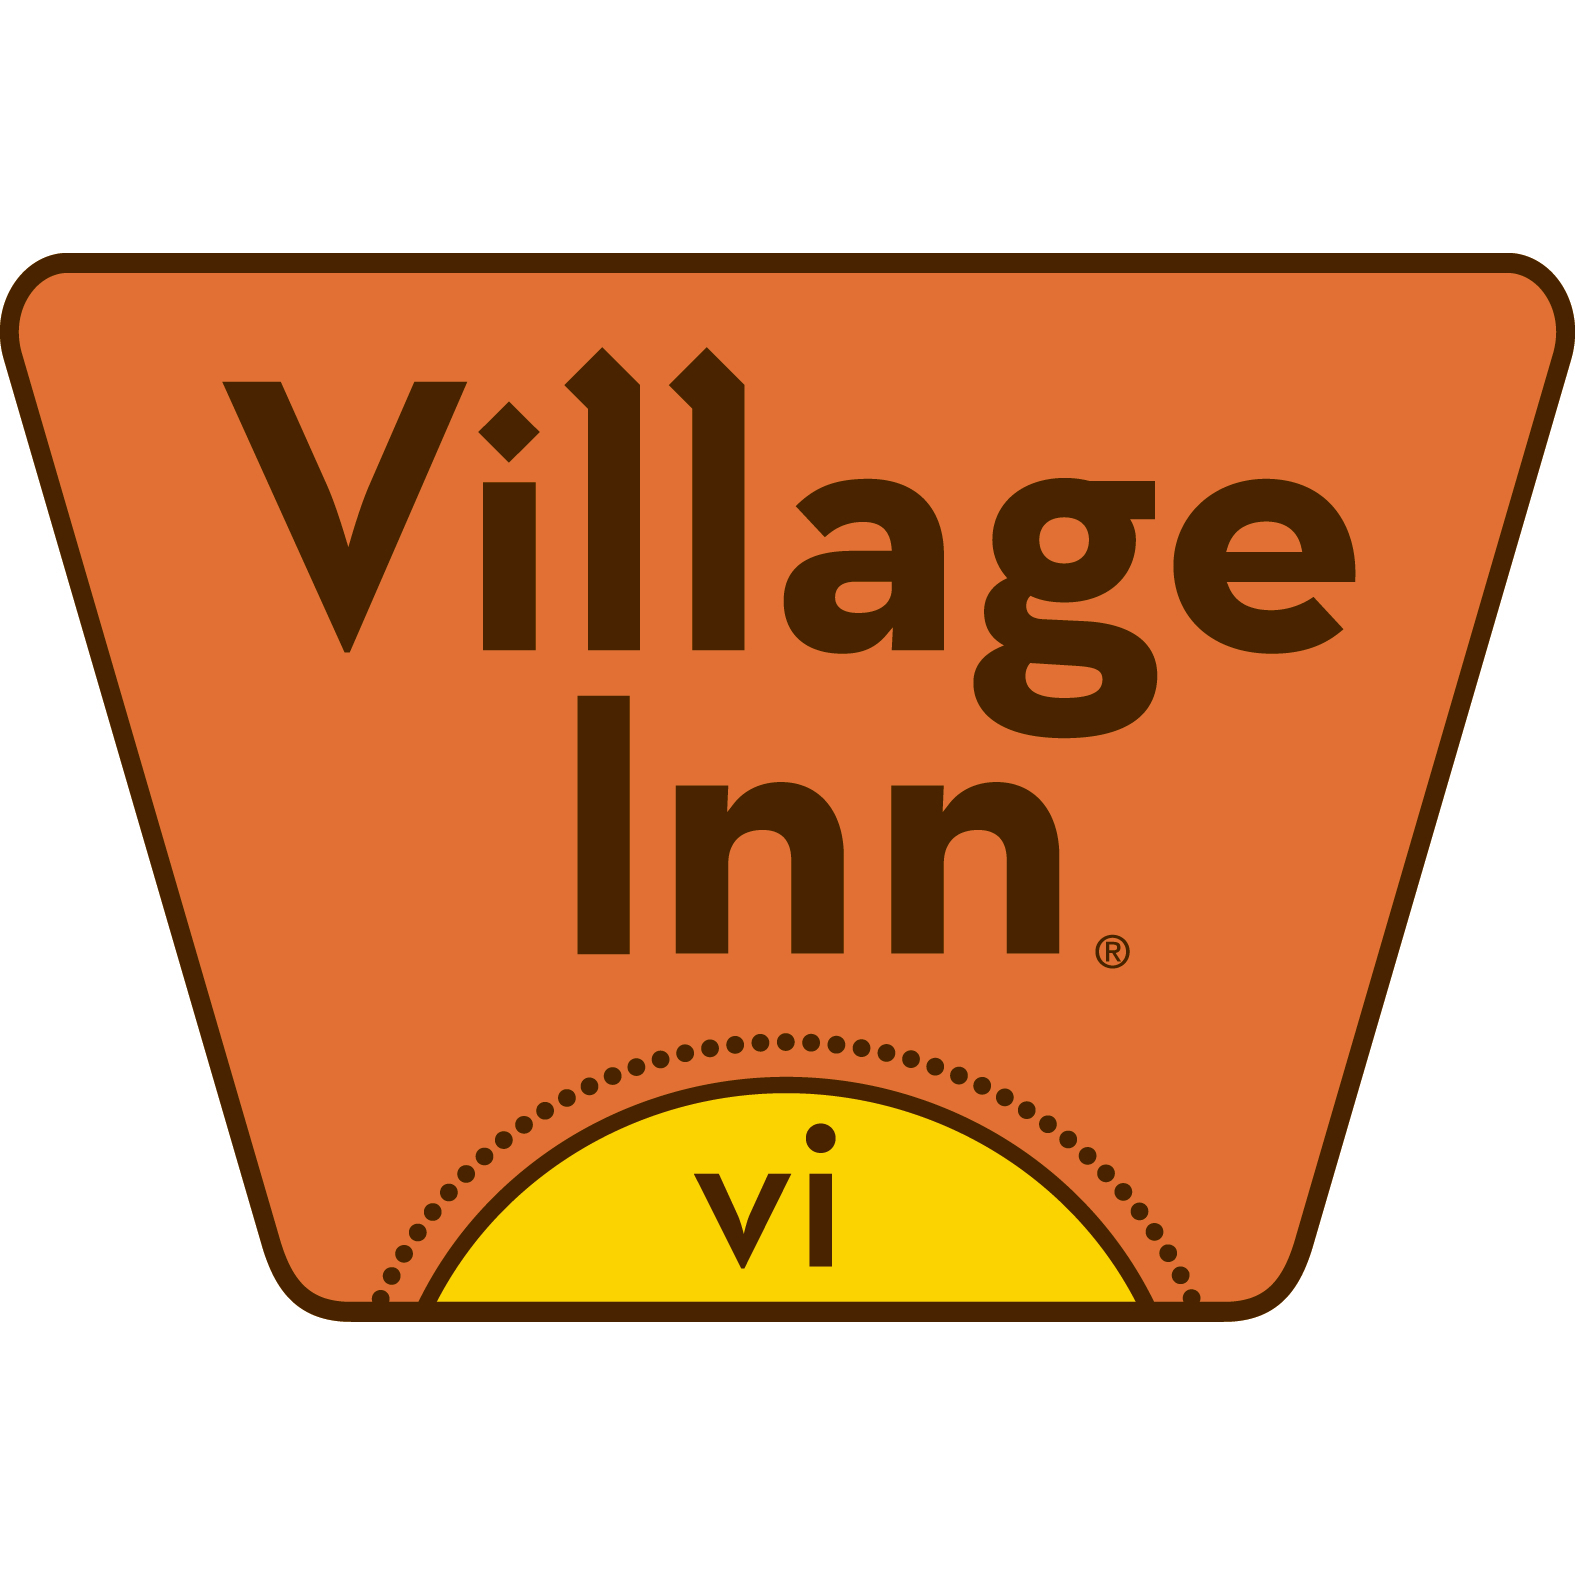 Village Inn - Closed